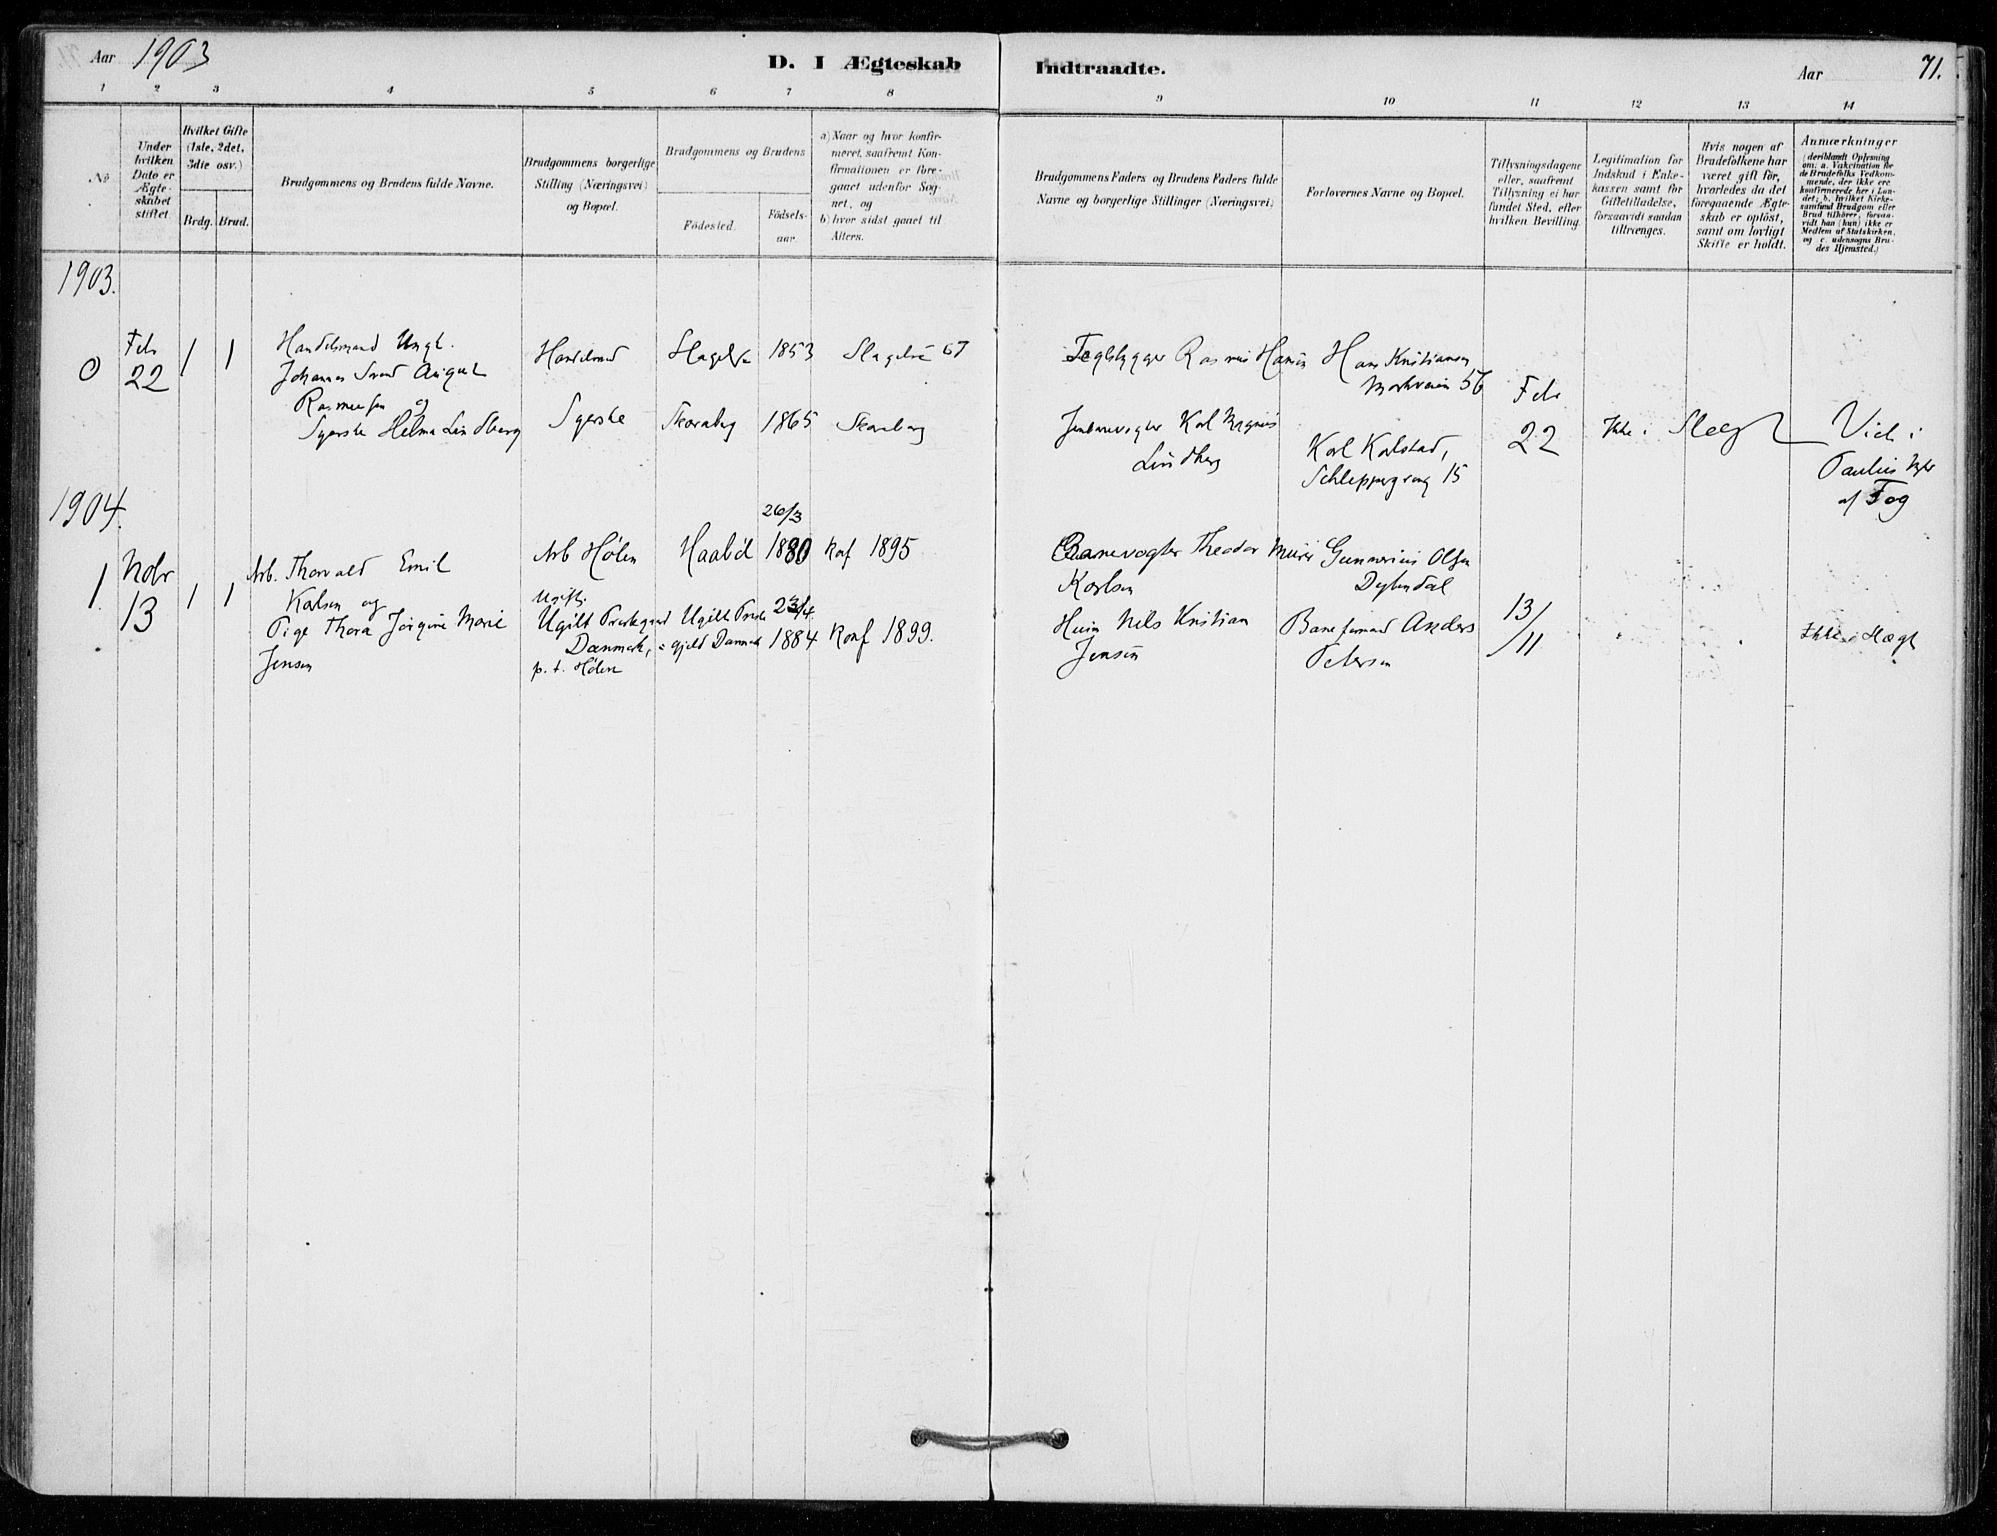 SAO, Vestby prestekontor Kirkebøker, F/Fe/L0001: Ministerialbok nr. V 1, 1878-1931, s. 71